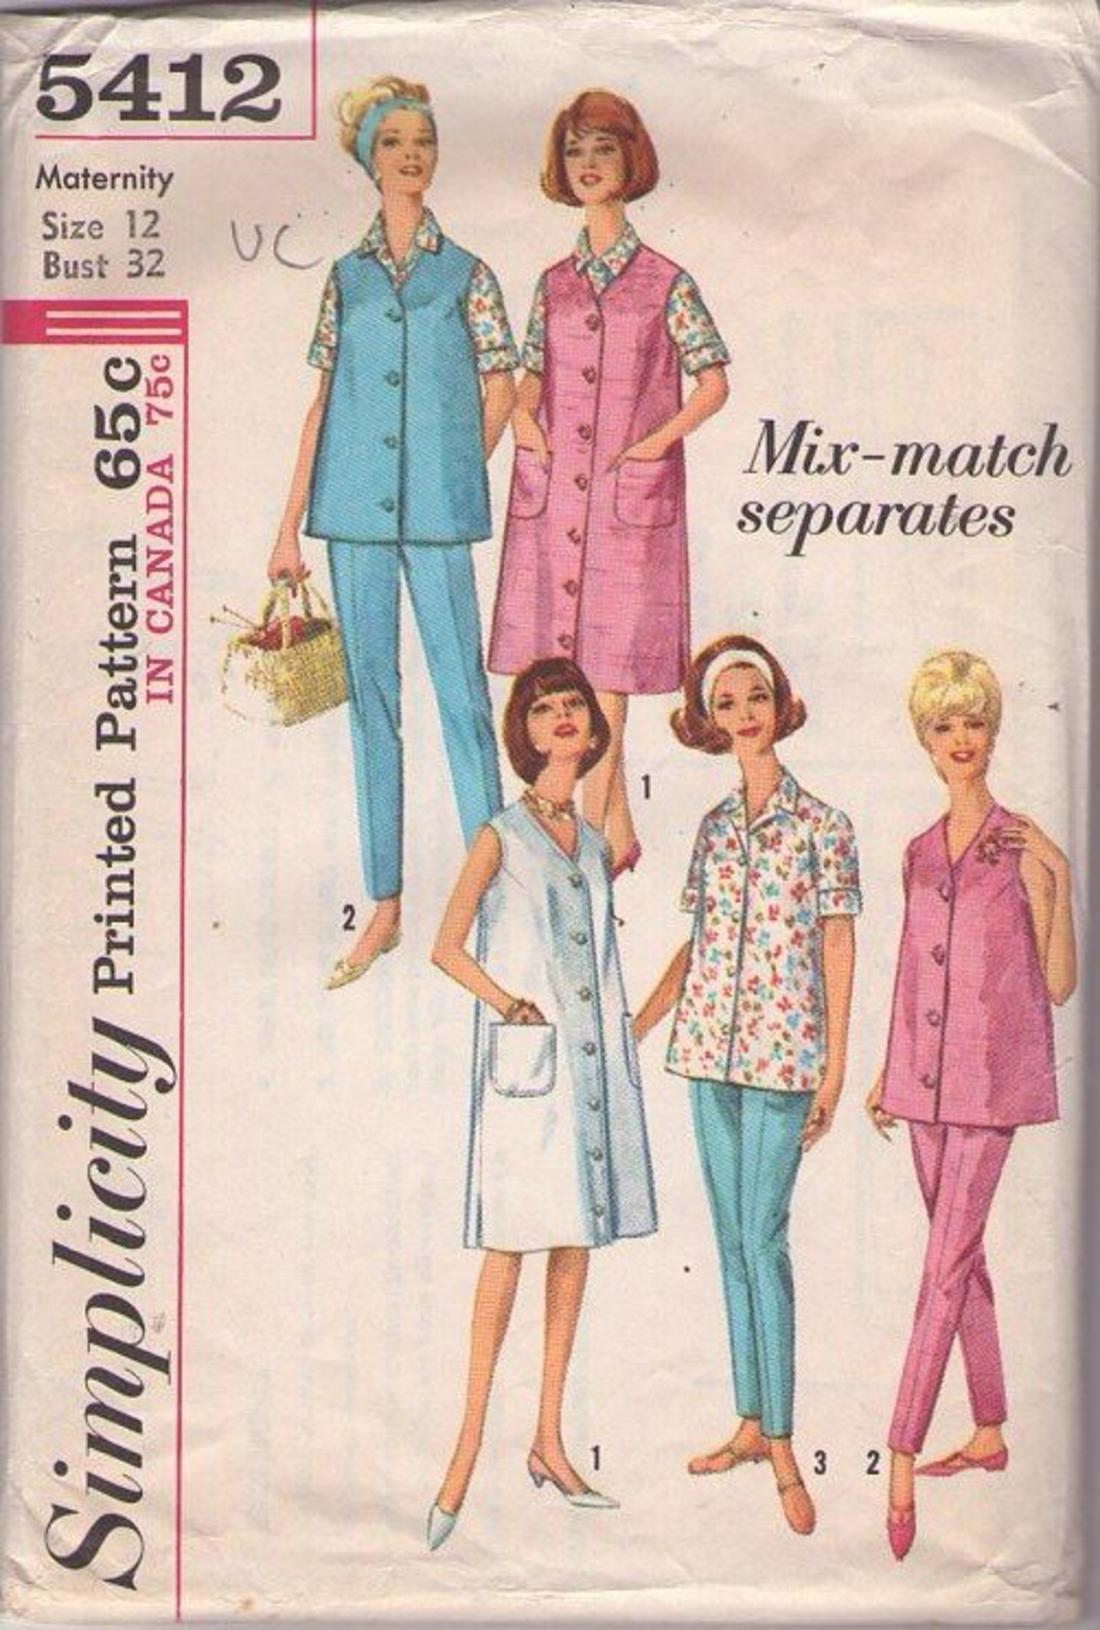 50e9e20553b9d MOMSPatterns Vintage Sewing Patterns - Simplicity 5412 Vintage 60's Sewing  Pattern SUPER CUTE Jackie O Maternity Blouse, Pants, Jumper, Coat Dress Mix  ...